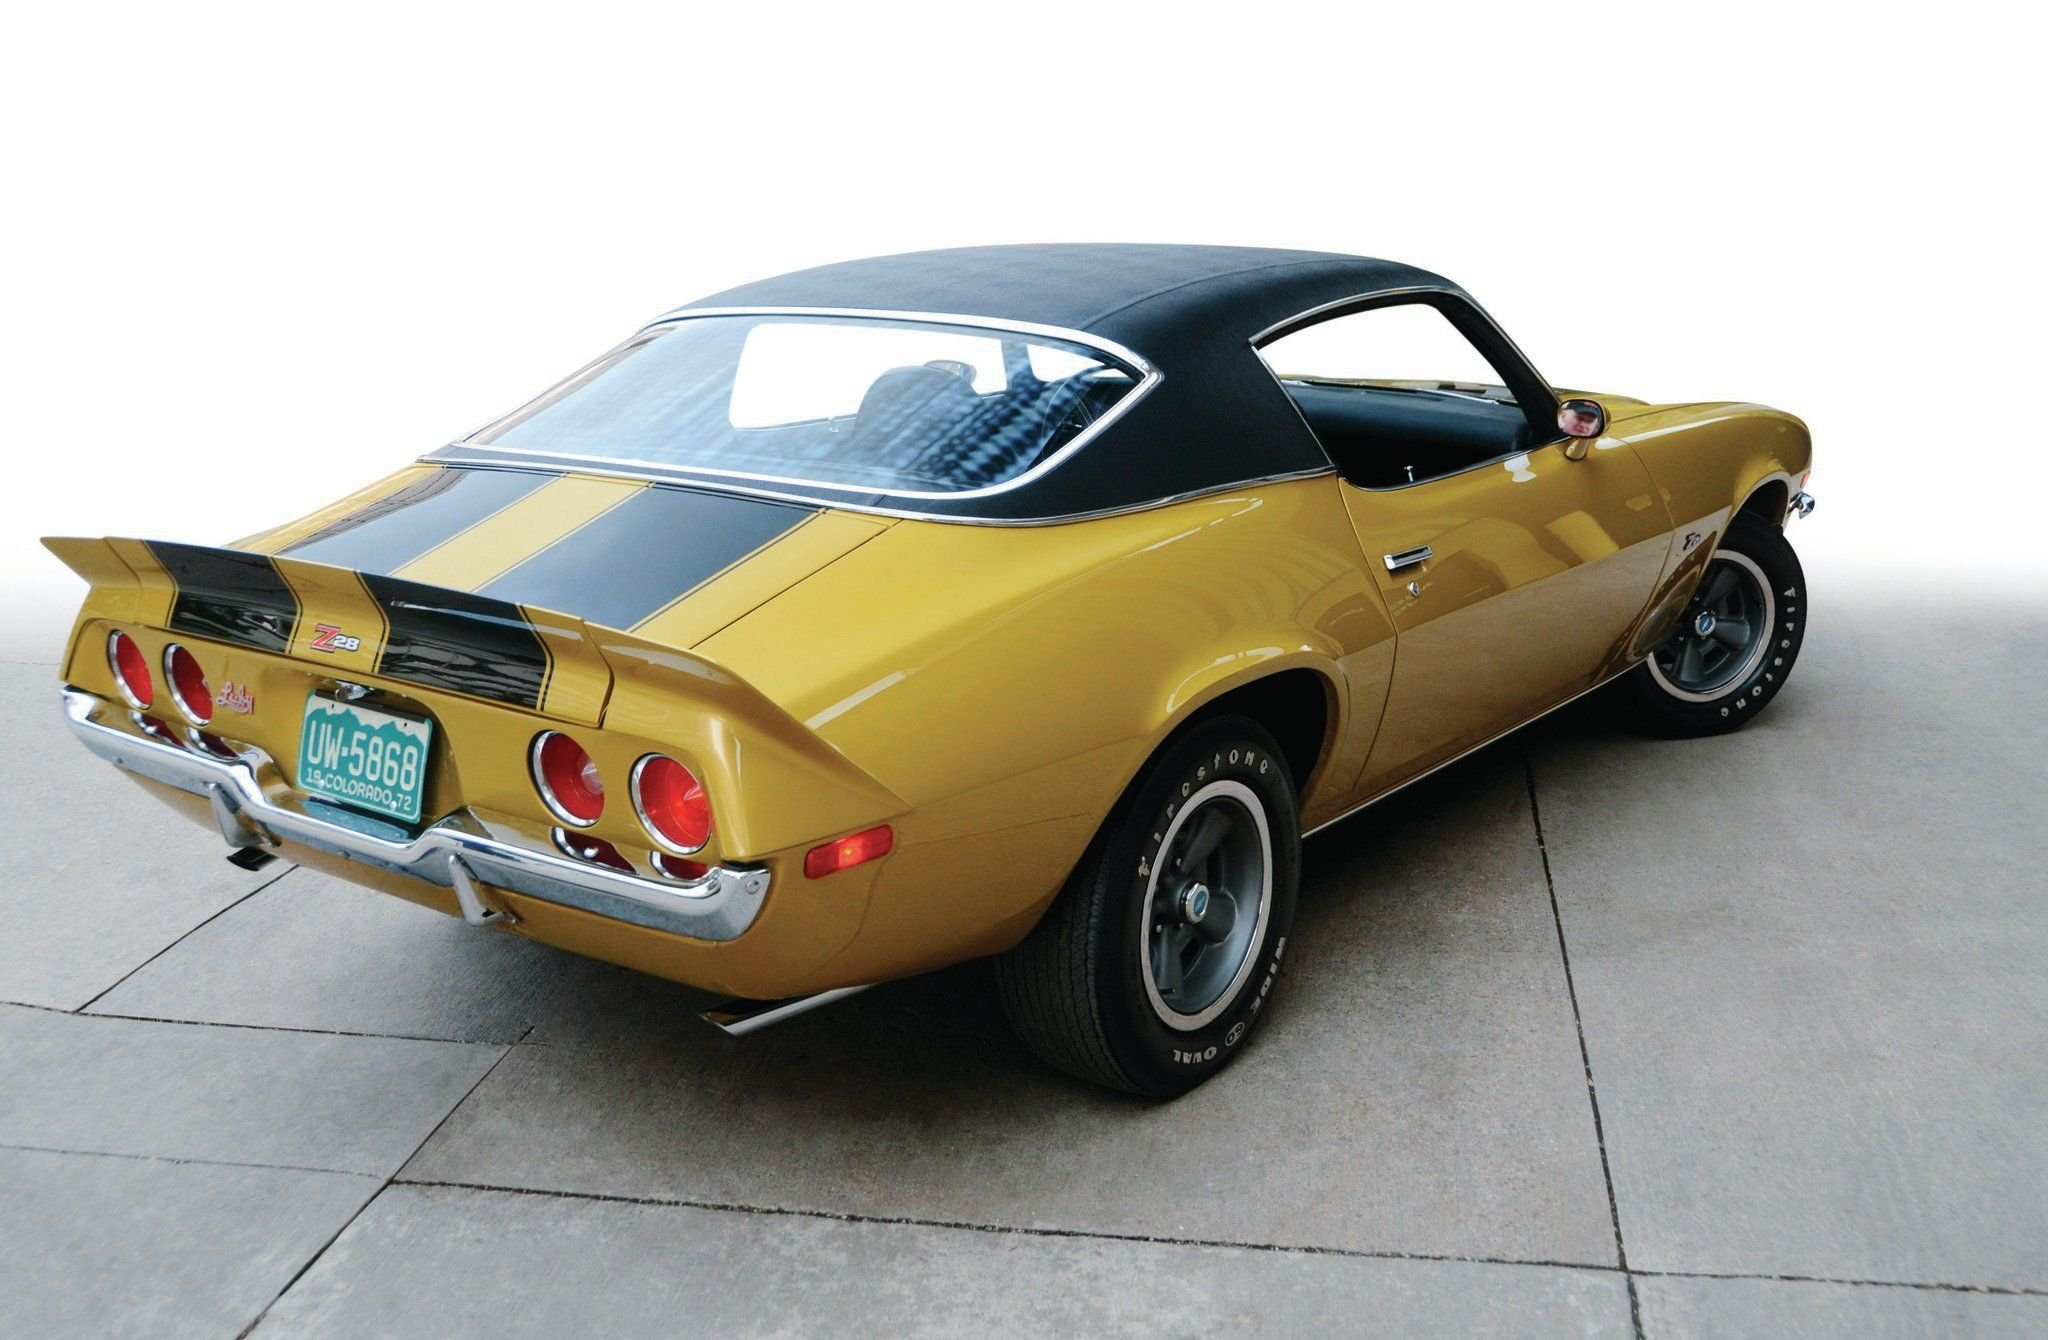 1972 Chevrolet Camato LT-03 wallpaper